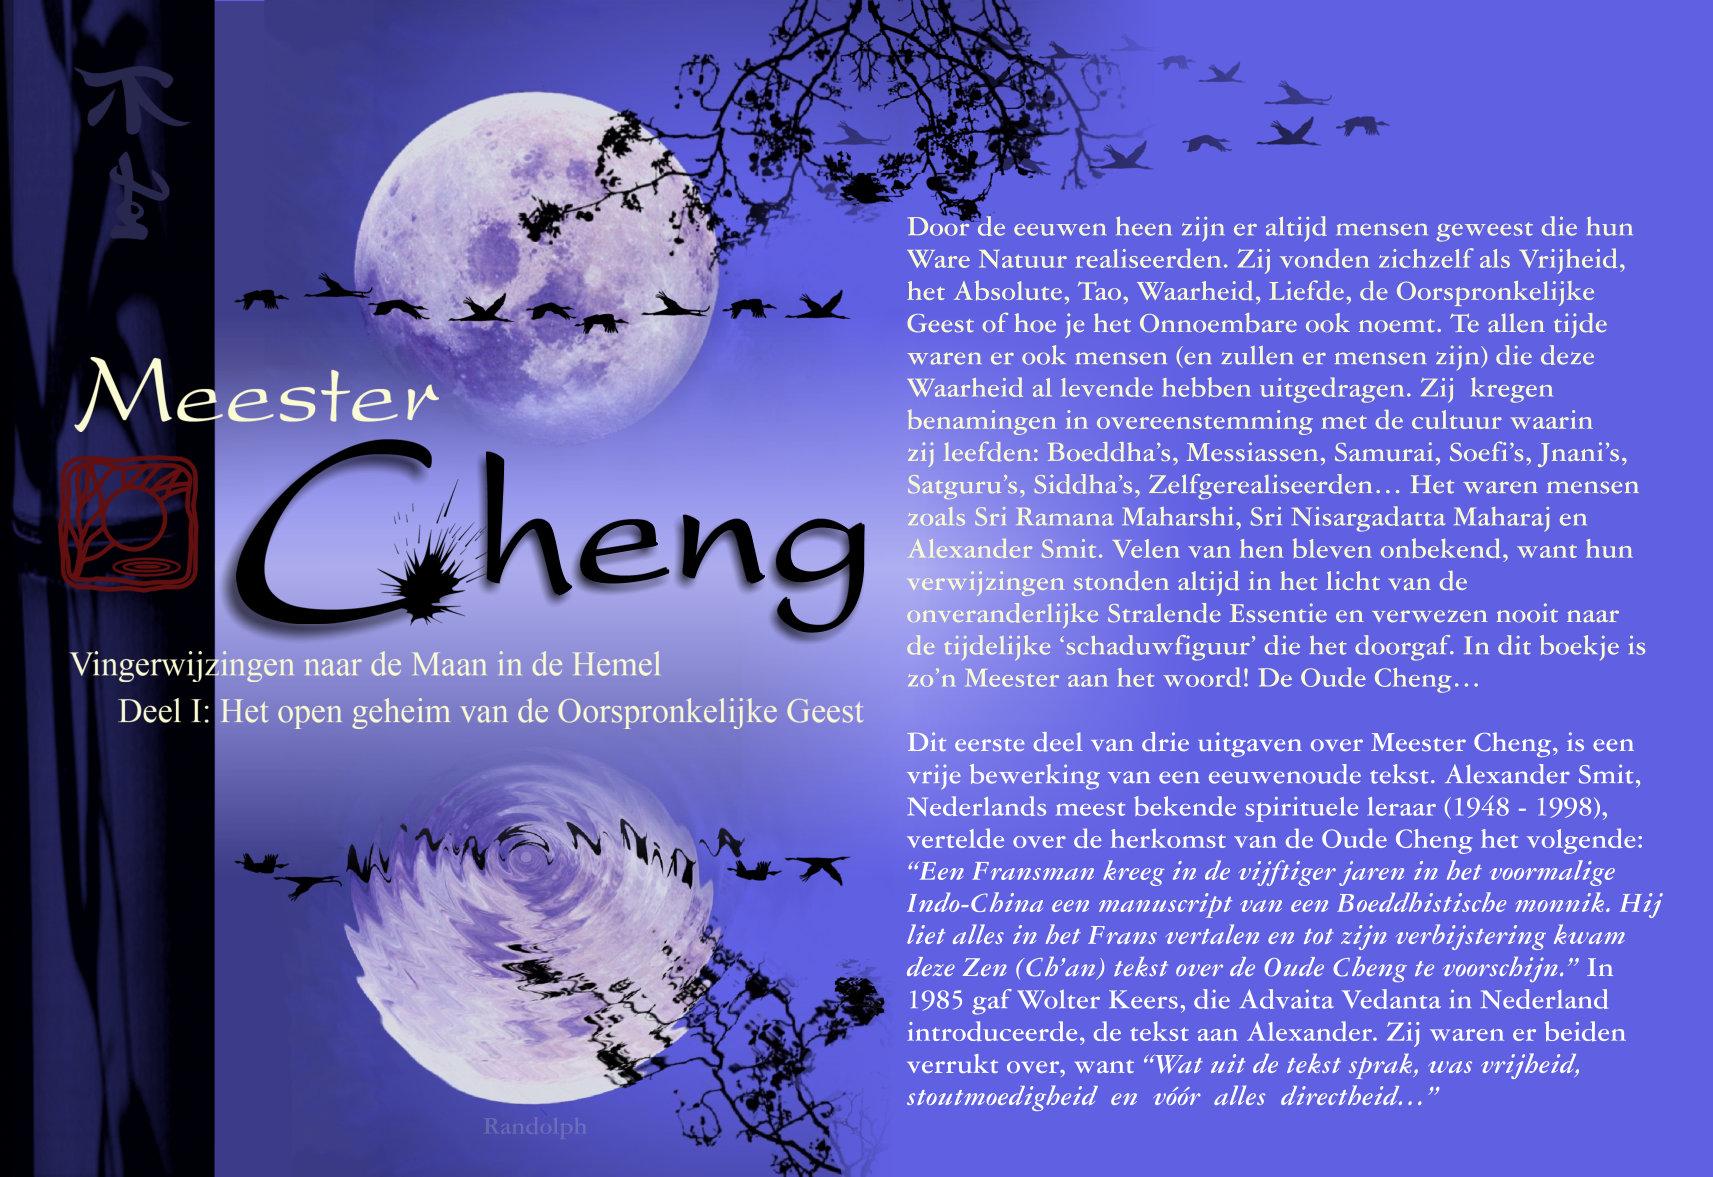 Meester Cheng I voorkant en binnenflap.jpg